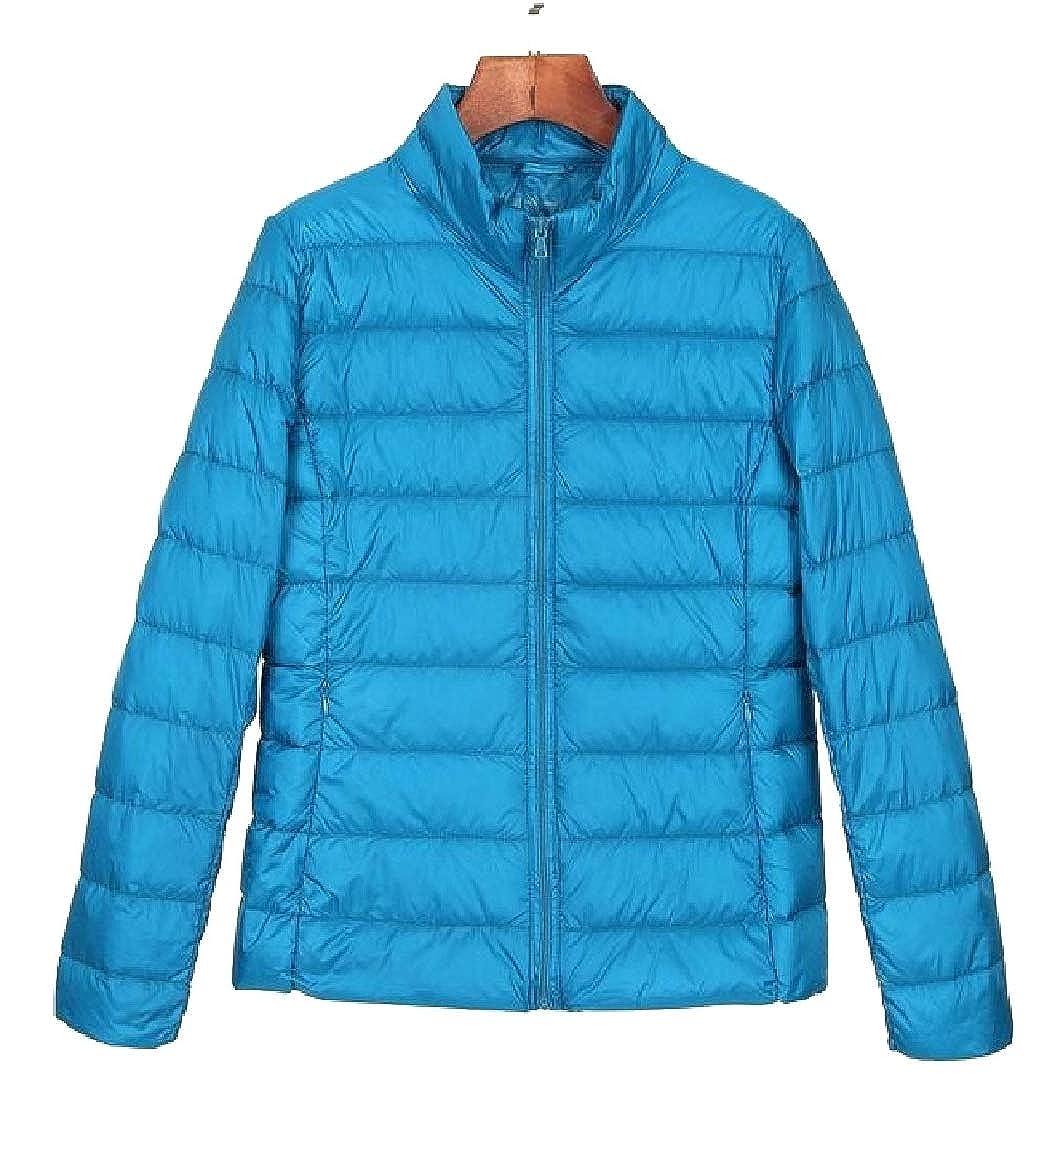 bluee Qiangjinjiu Women Stand Collar Long Sleeve Lightweight Down Jacket Coat